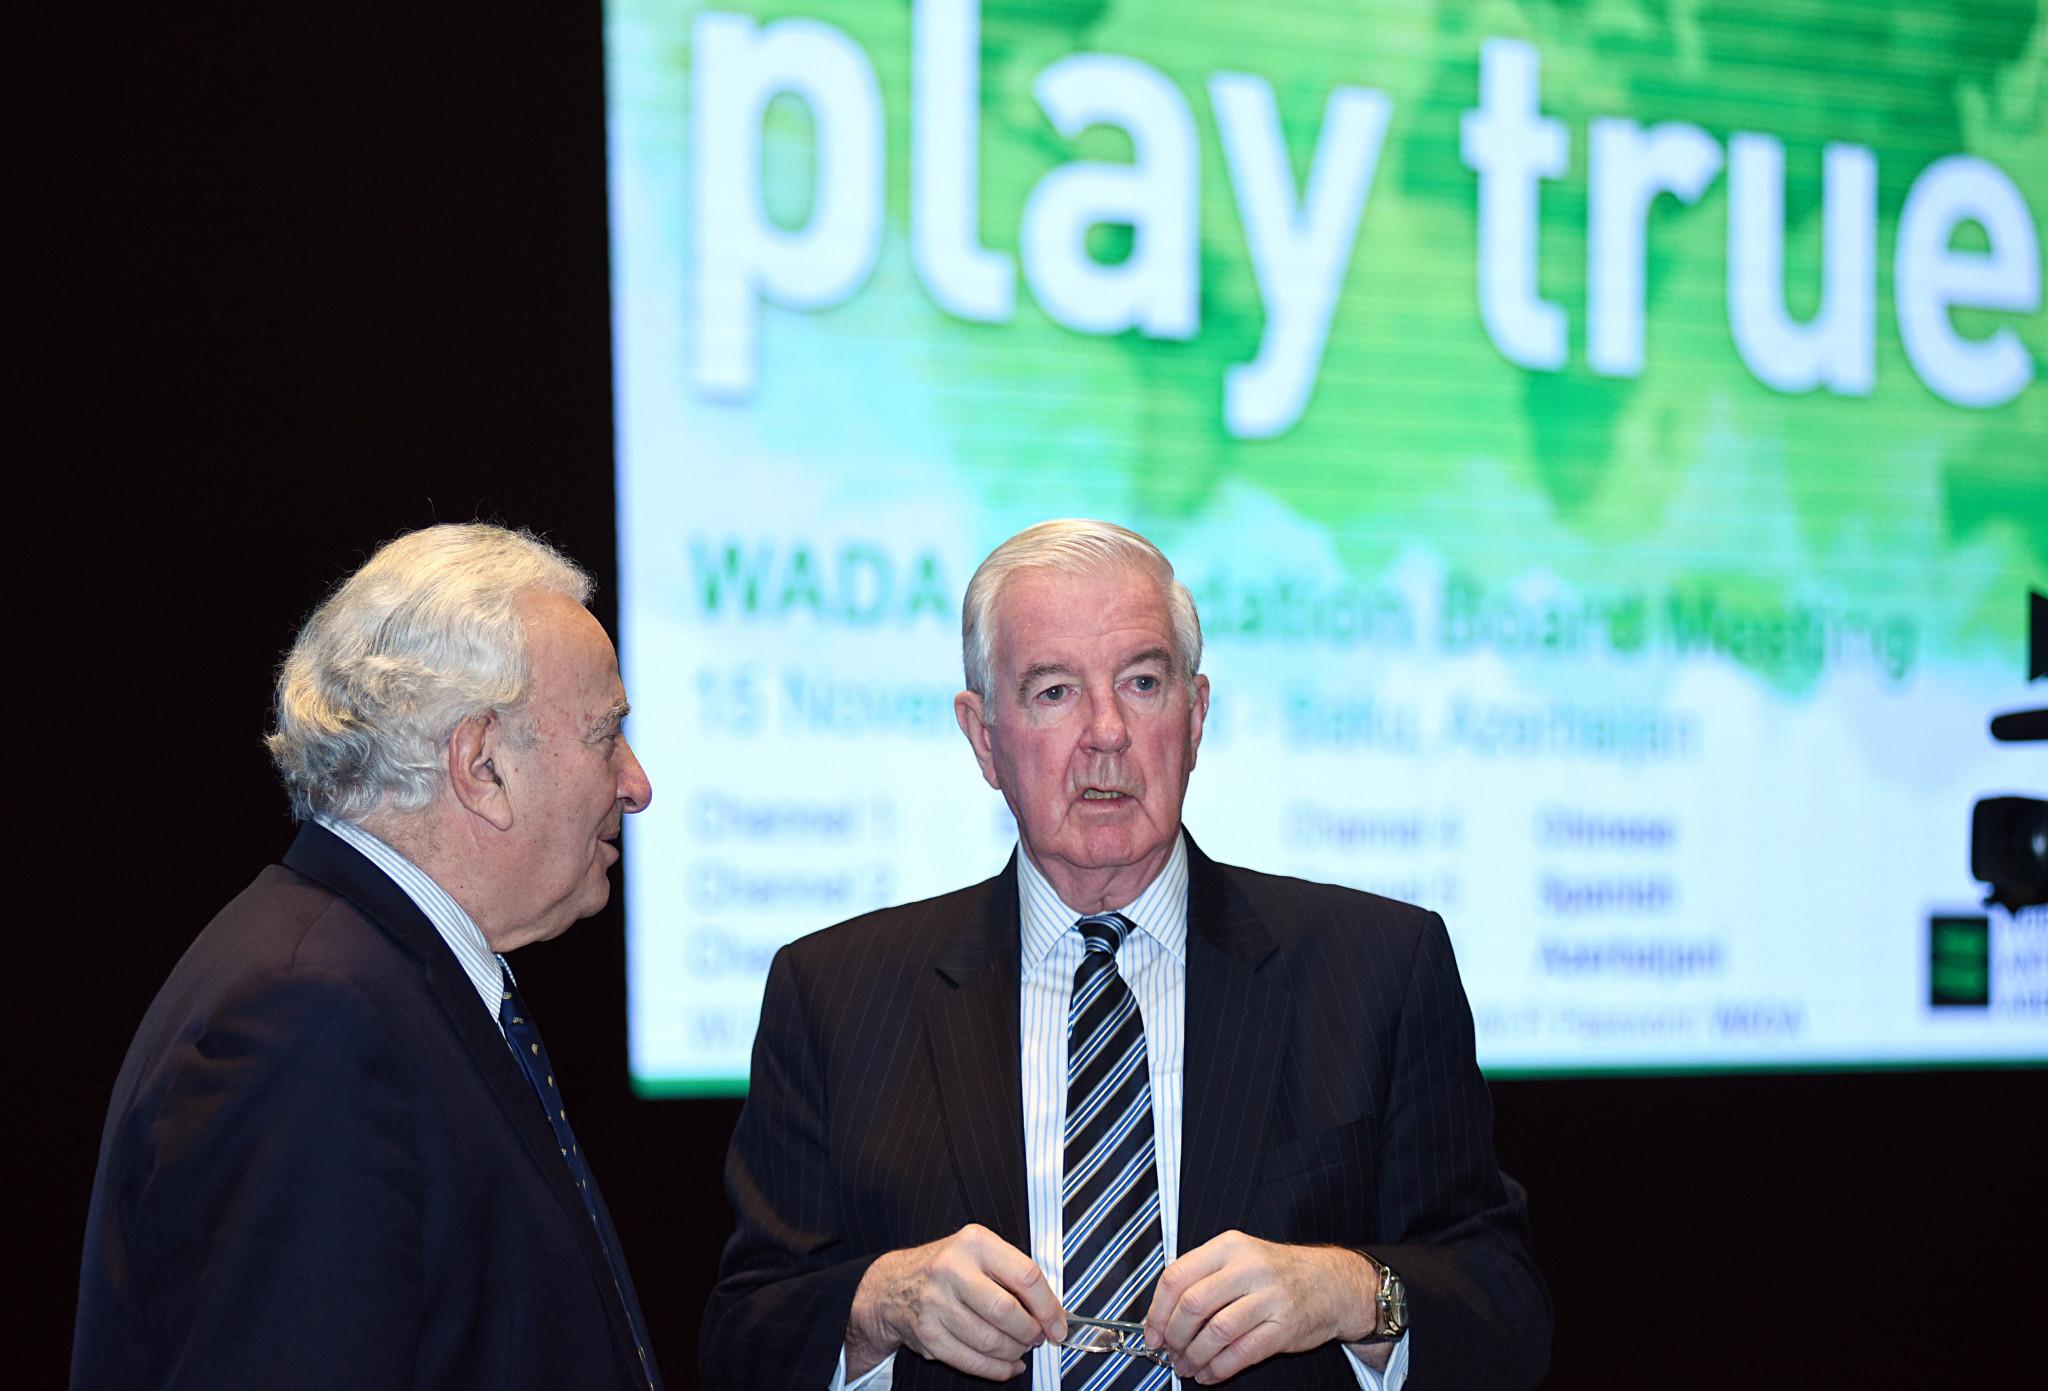 WADA President Sir Craig Reedie was in bullish mood in Baku ©Getty Images